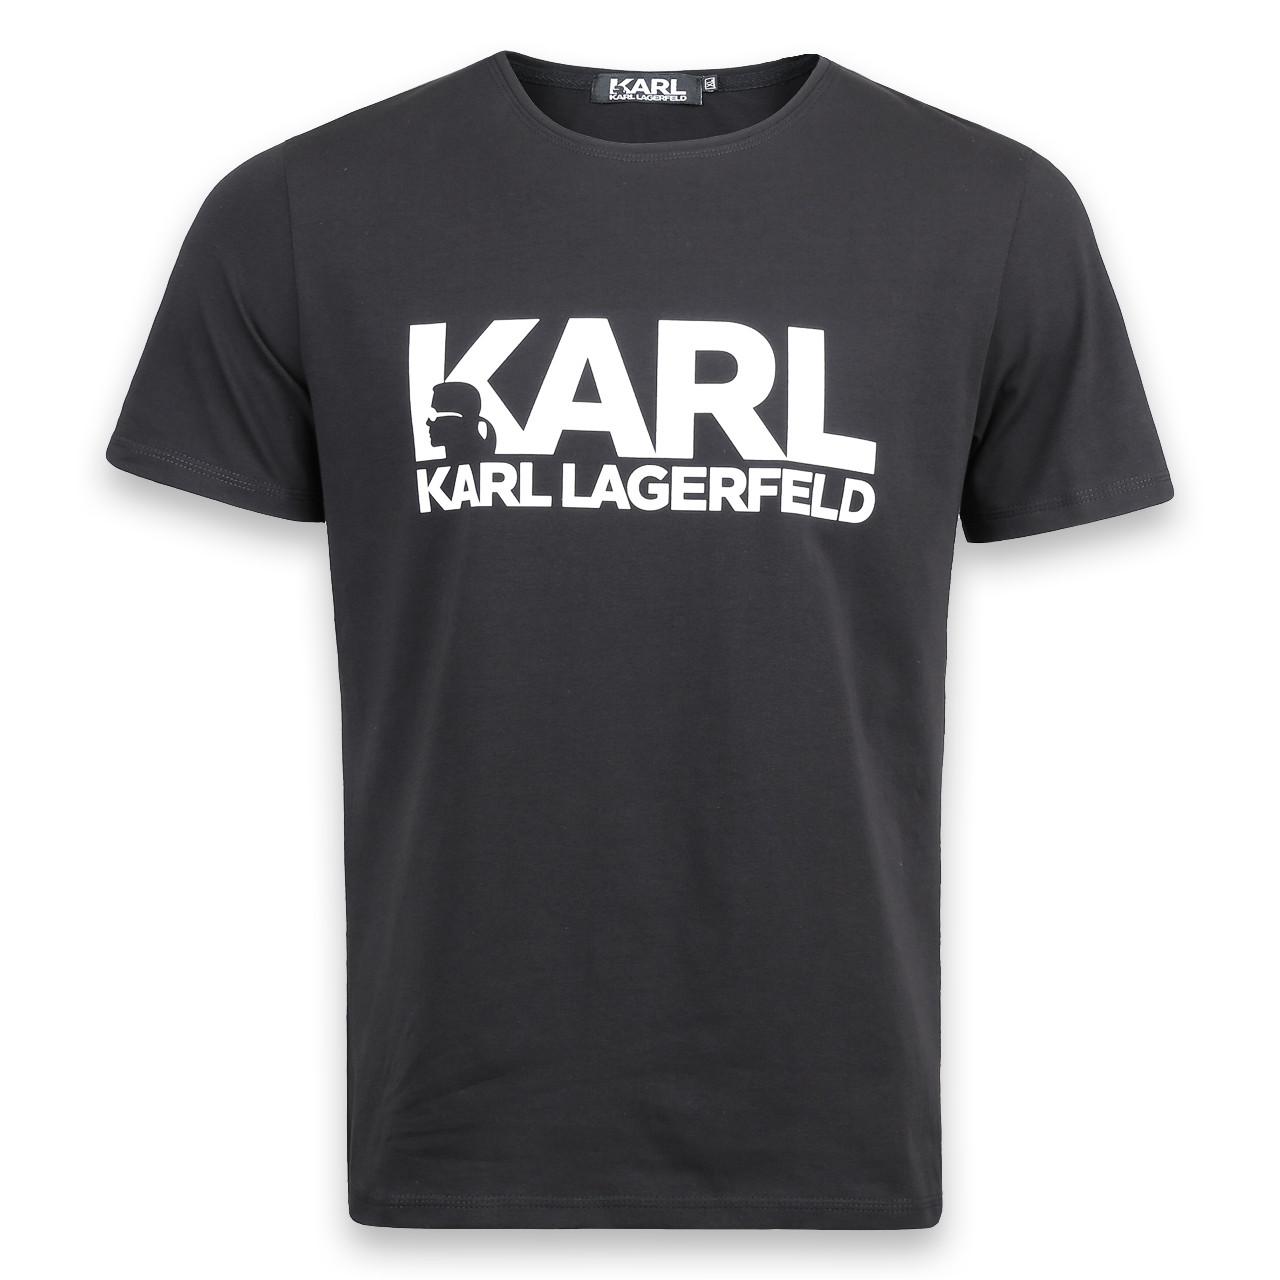 Футболка мужская черная KARL LAGERFELD с принтом №1 Ф-10 BLK L(Р) 20-838-020